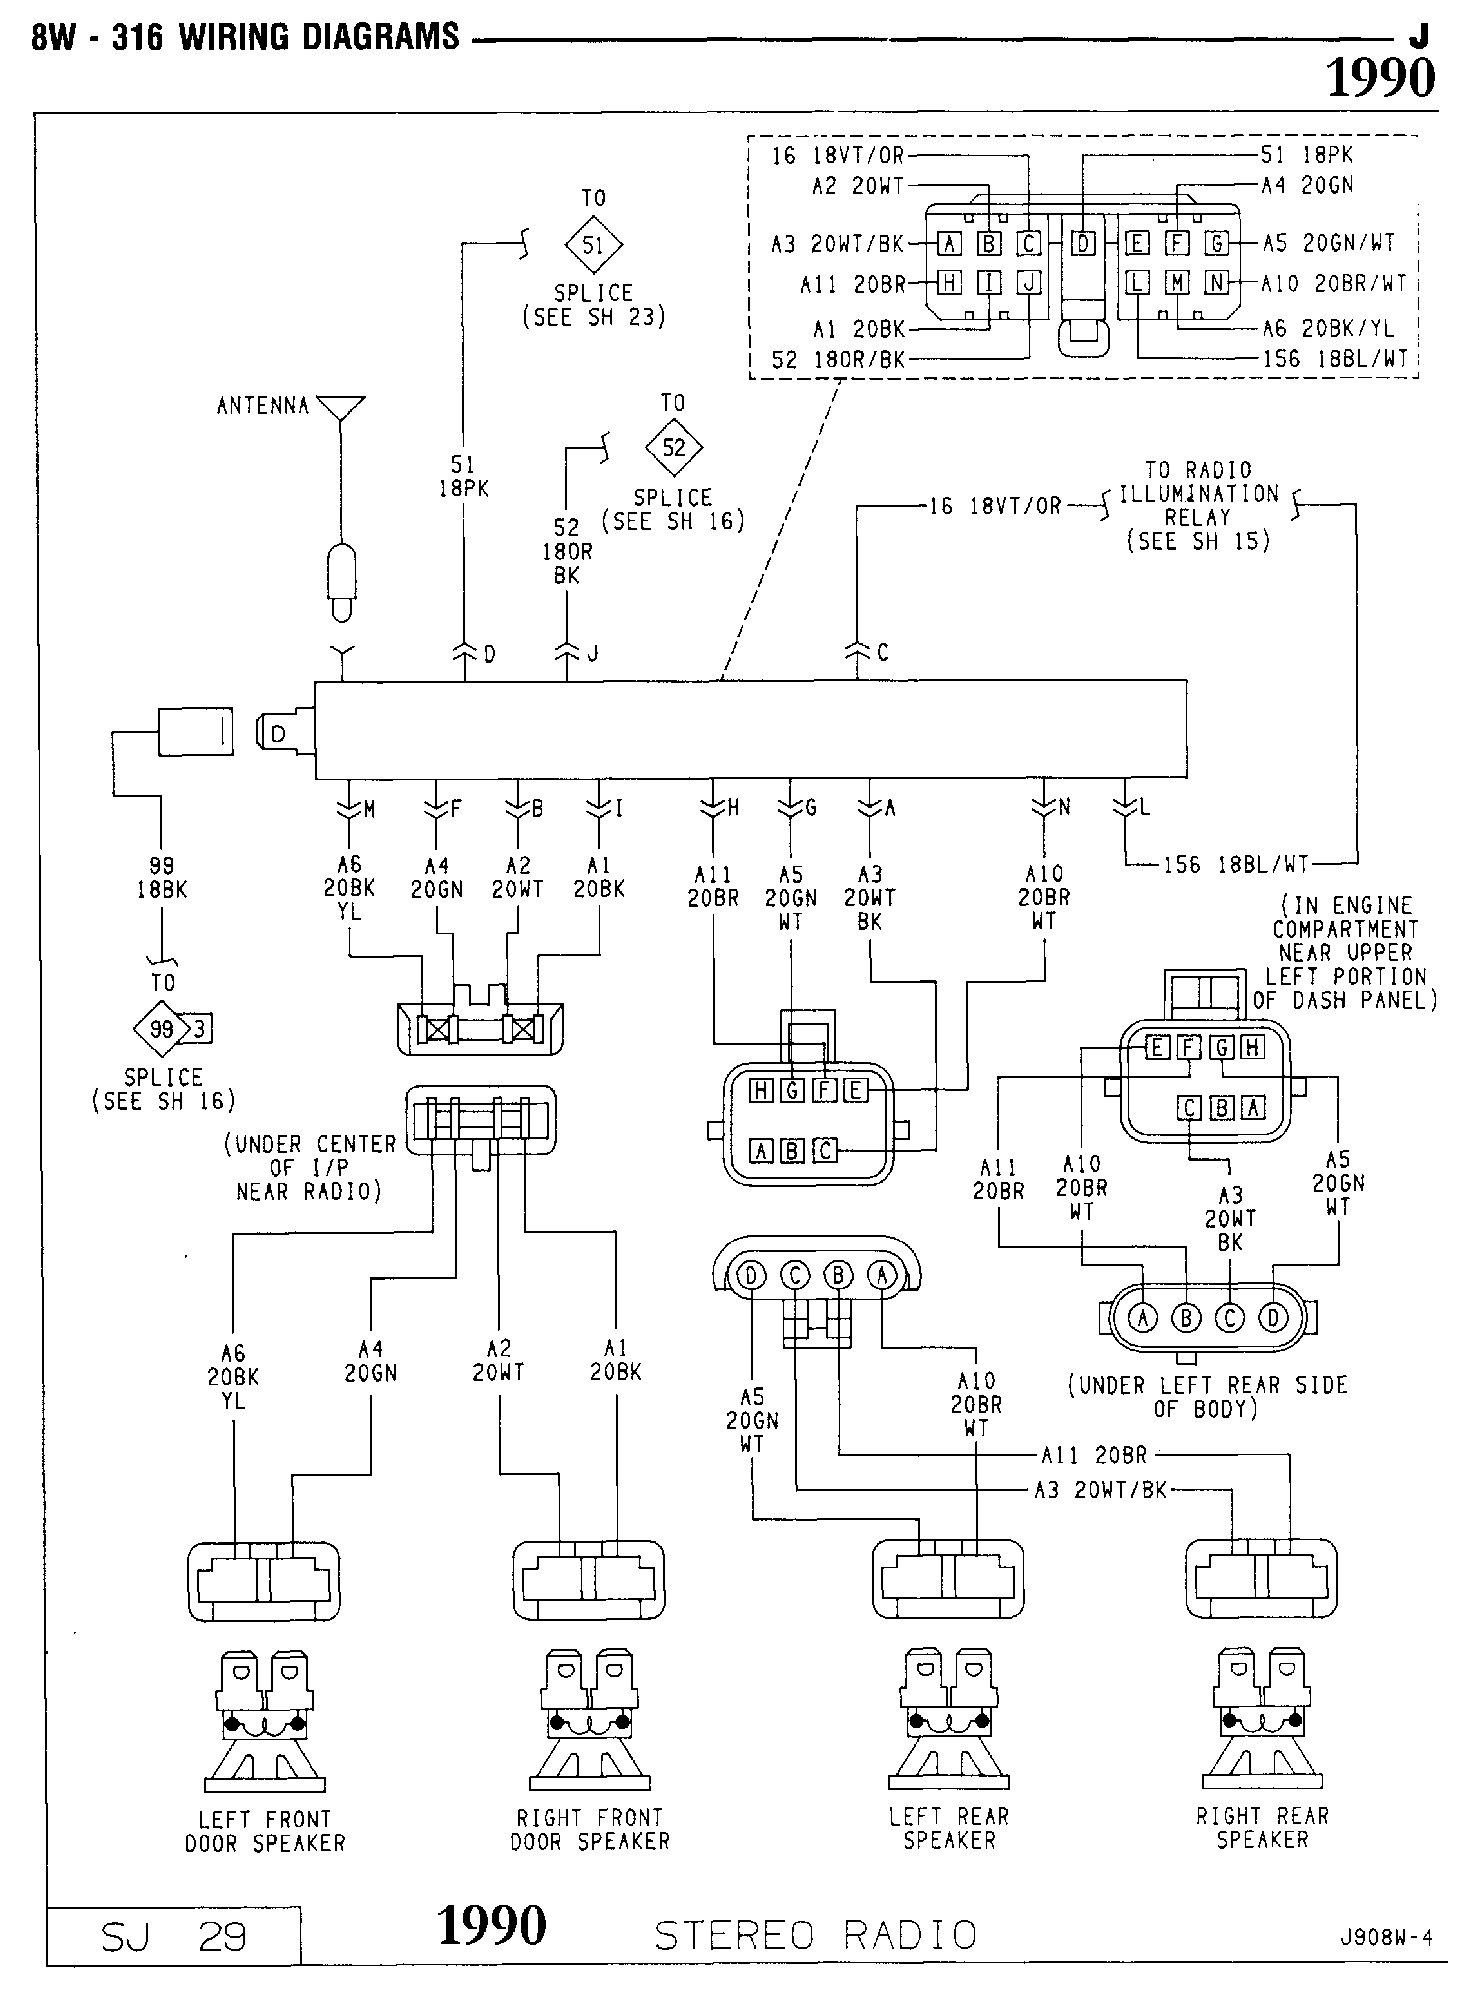 Jeep cherokee wiring diagrams images diagram and writign diagram radio wiring diagram jeep cherokee 1990 radio download wirning 1990 jeep cherokee radio wiring diagram wiring pooptronica Choice Image